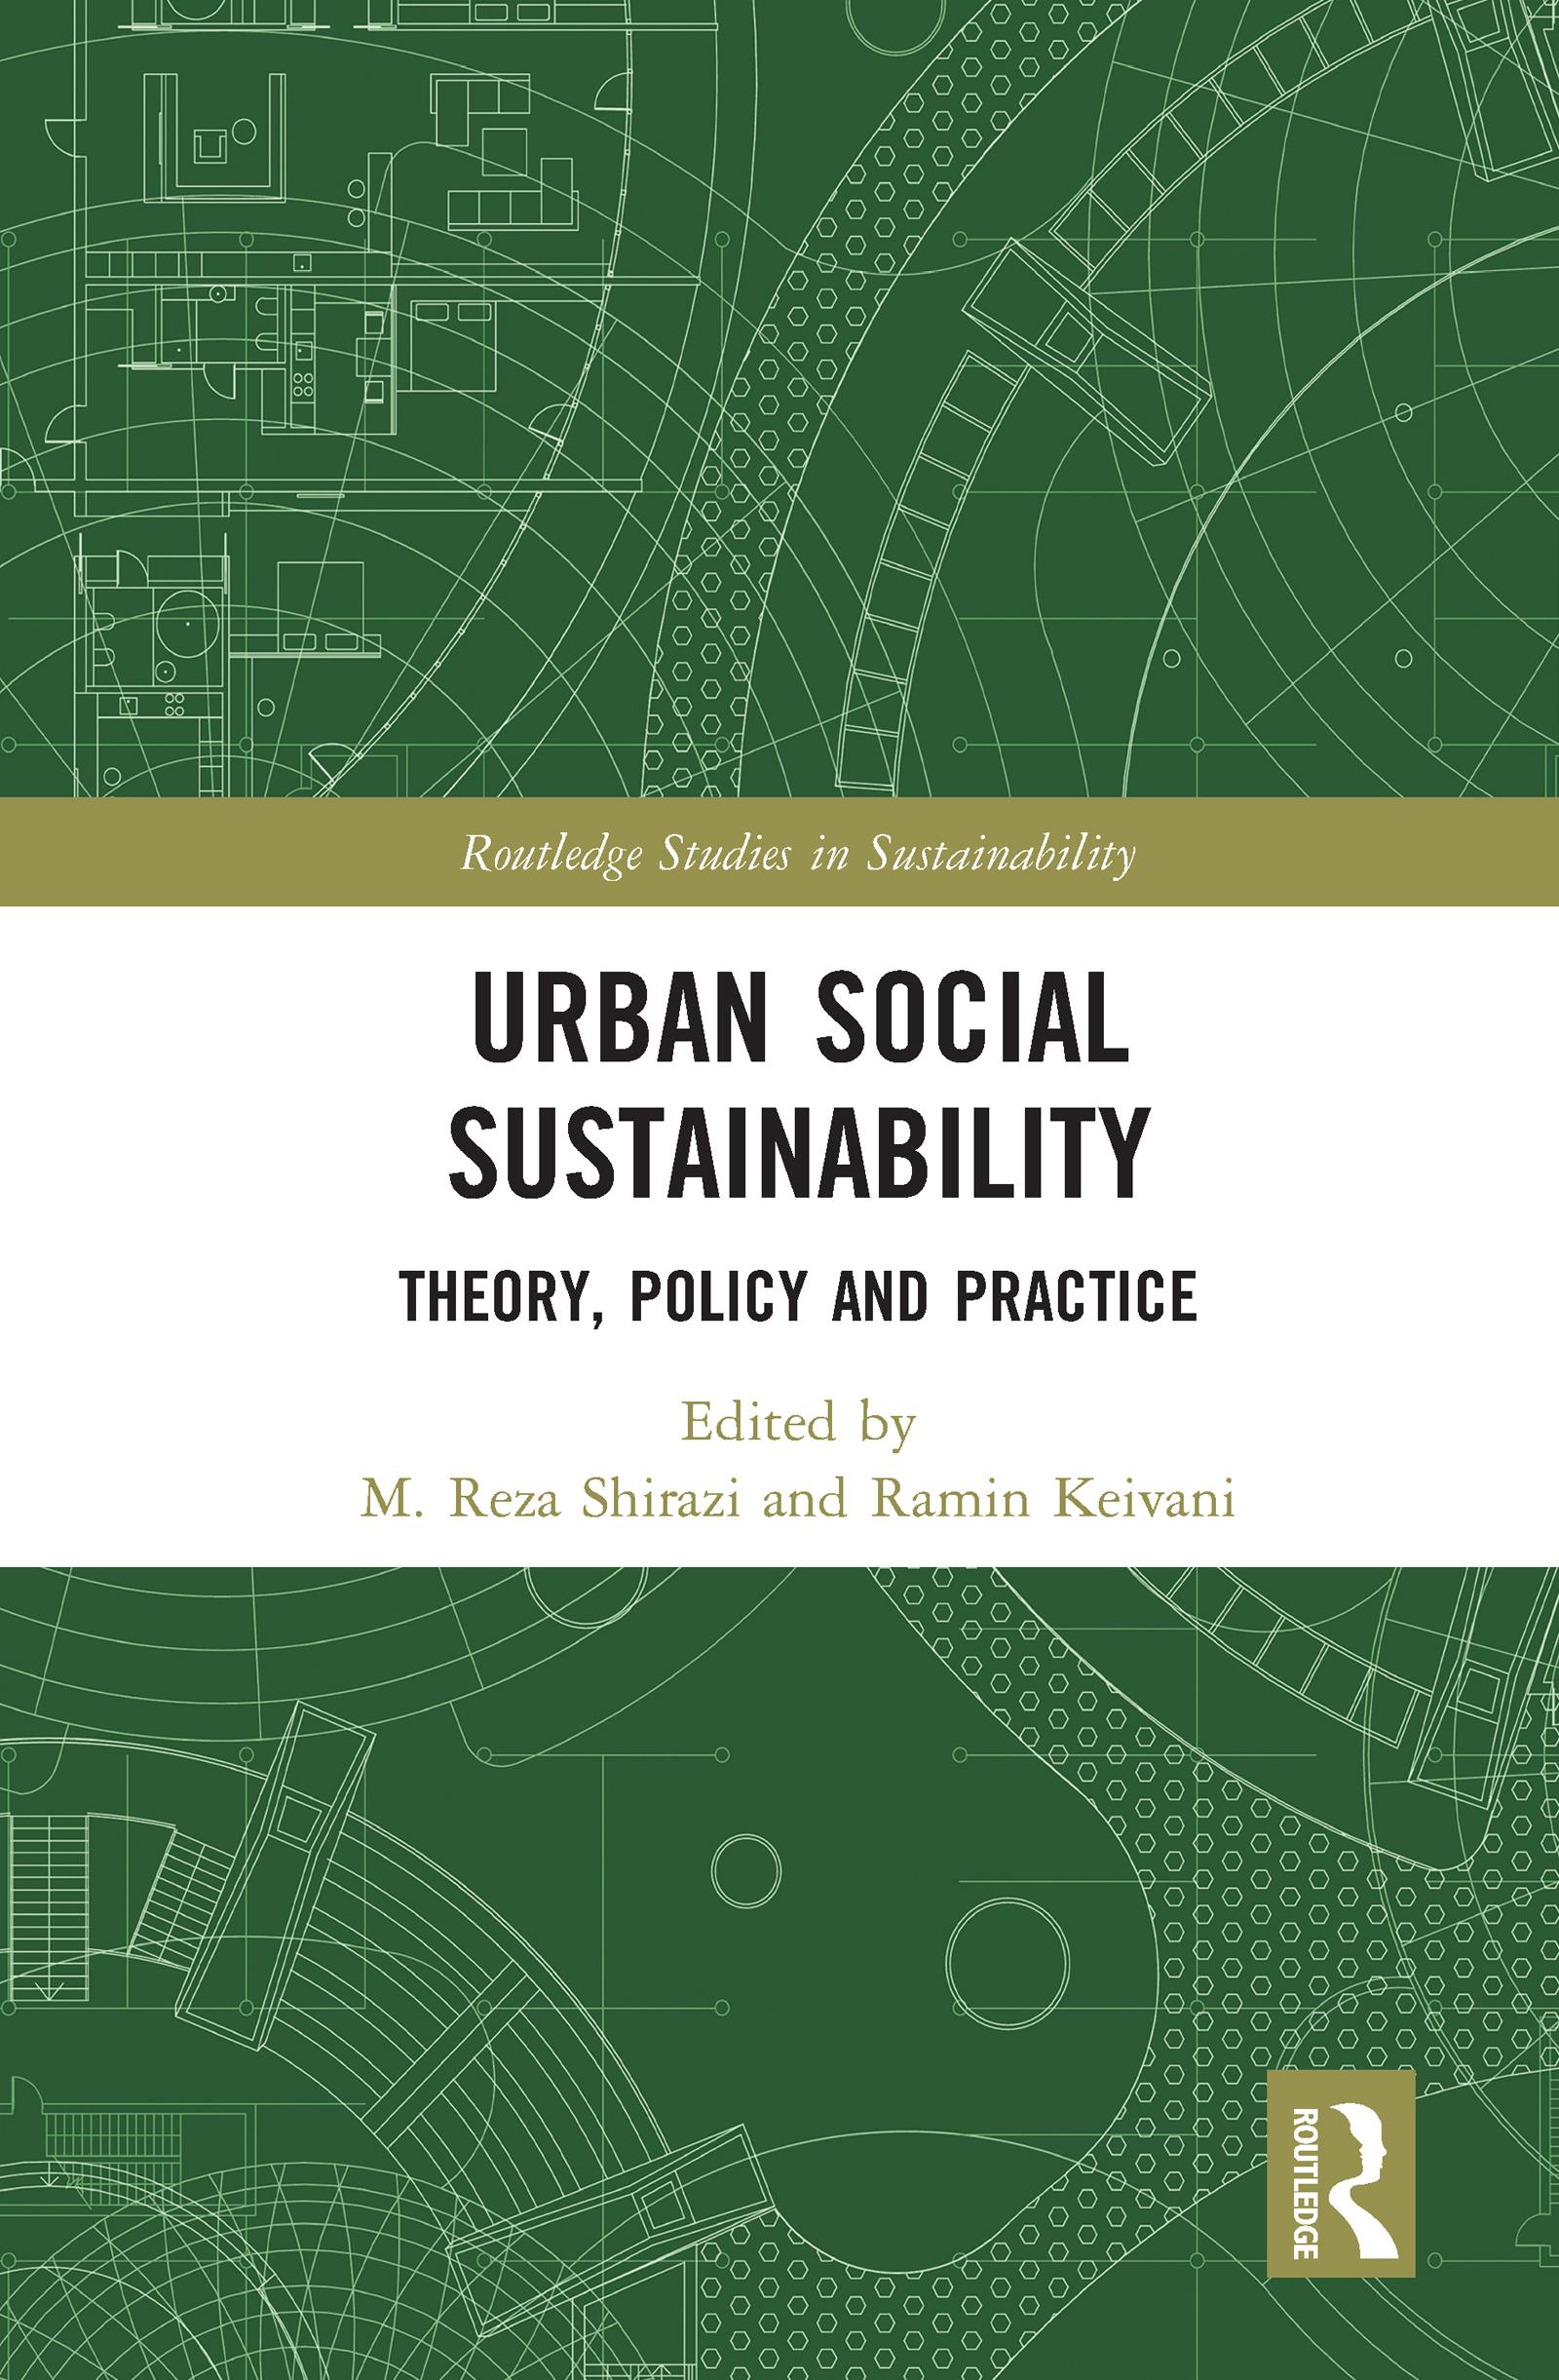 Urban Social Sustainability